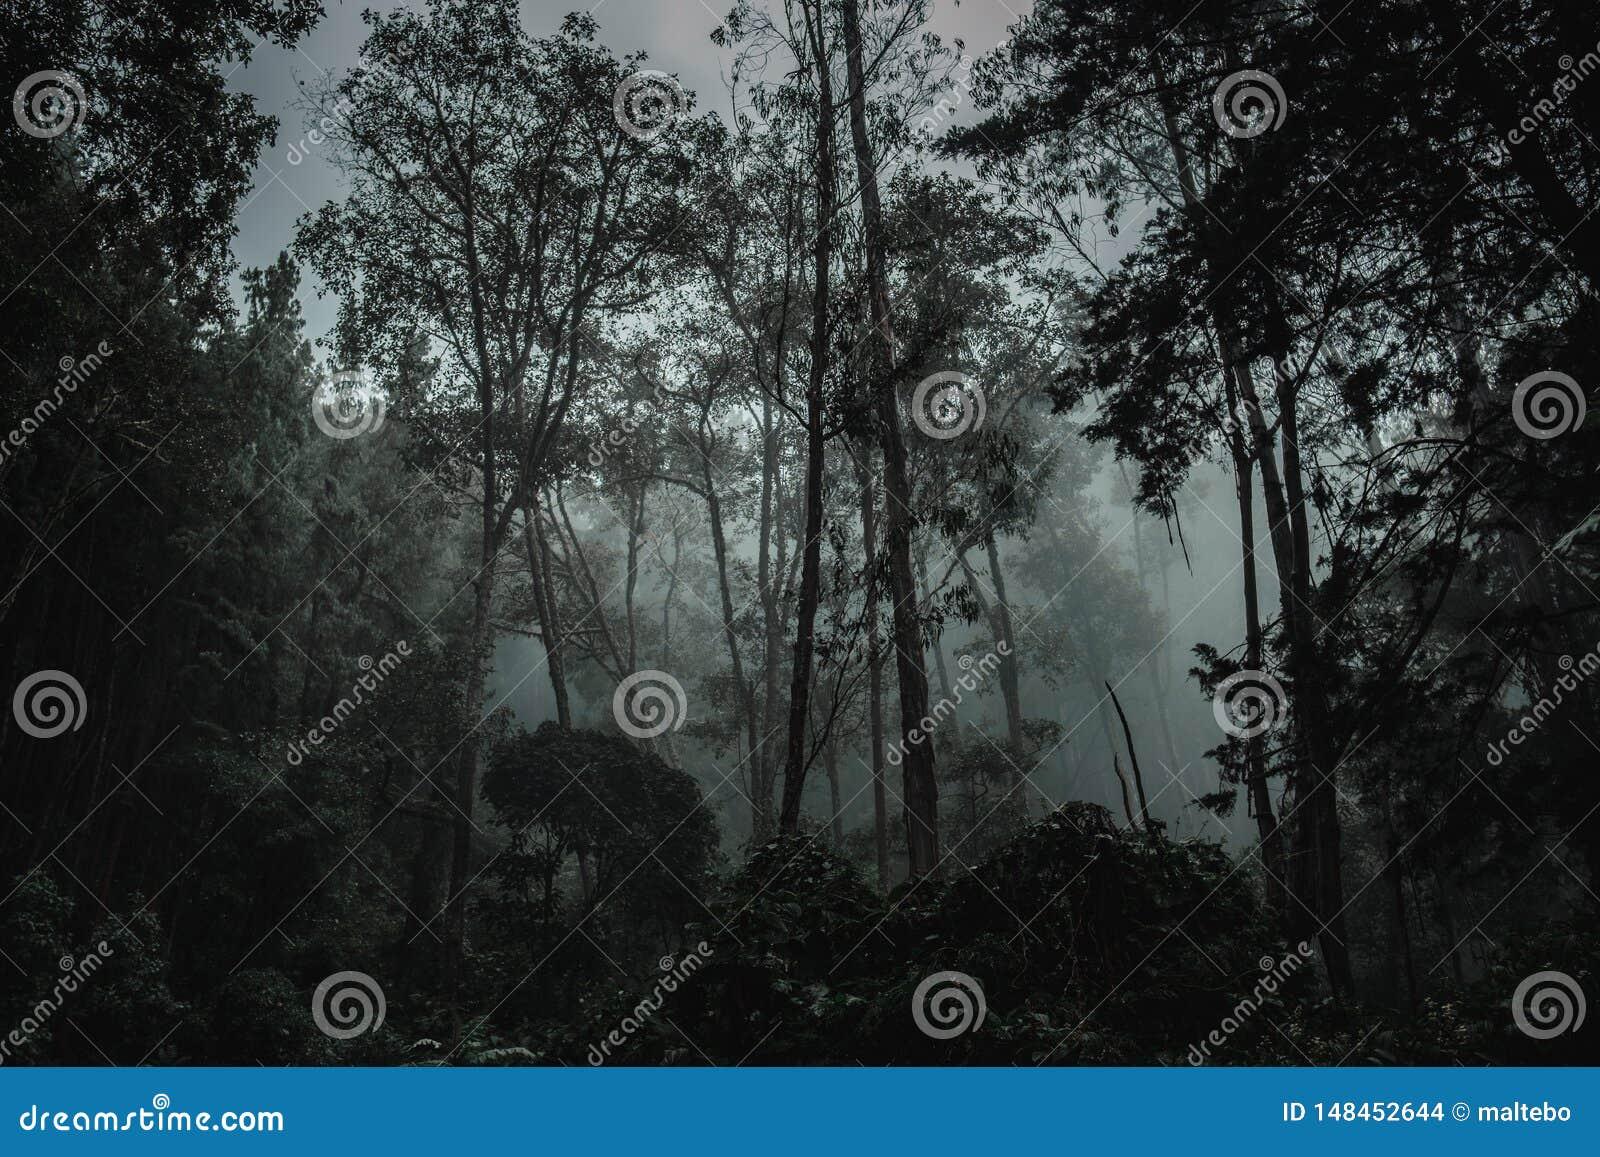 Deep in the dark amazon jungle